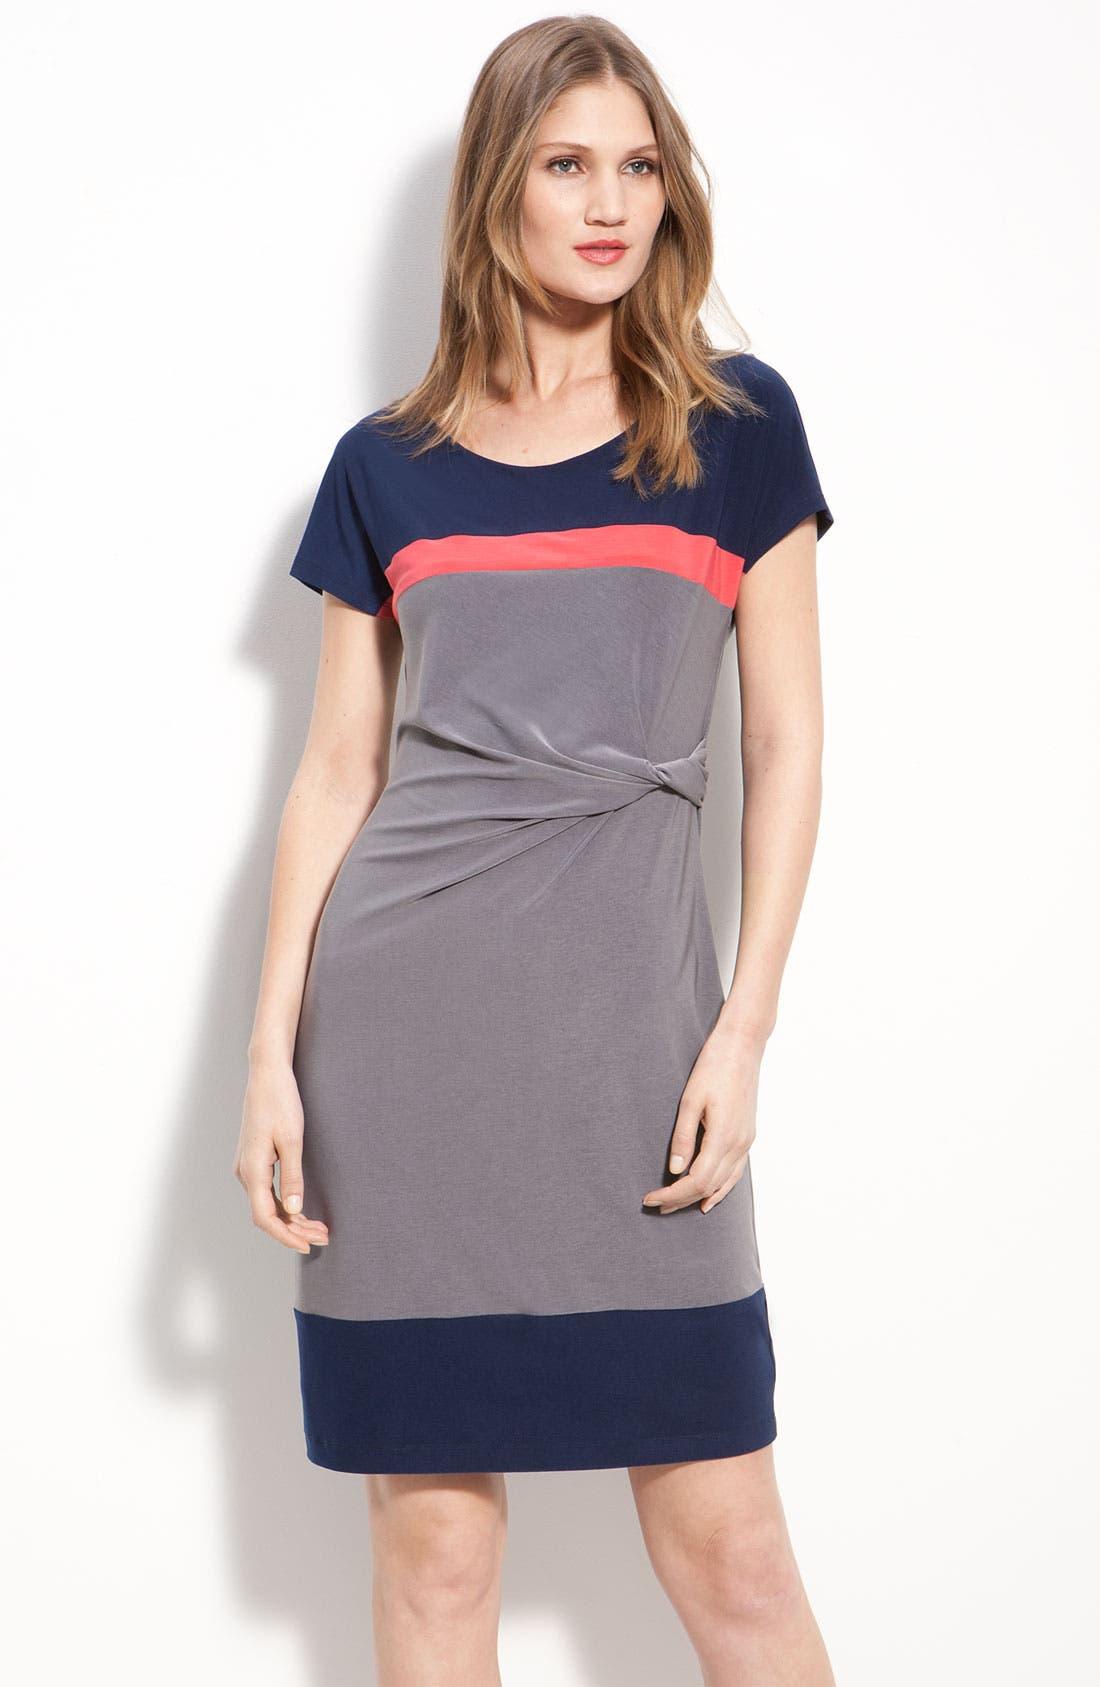 ALEX & AVA Twist Front Colorblock Jersey Sheath Dress, Main, color, 020